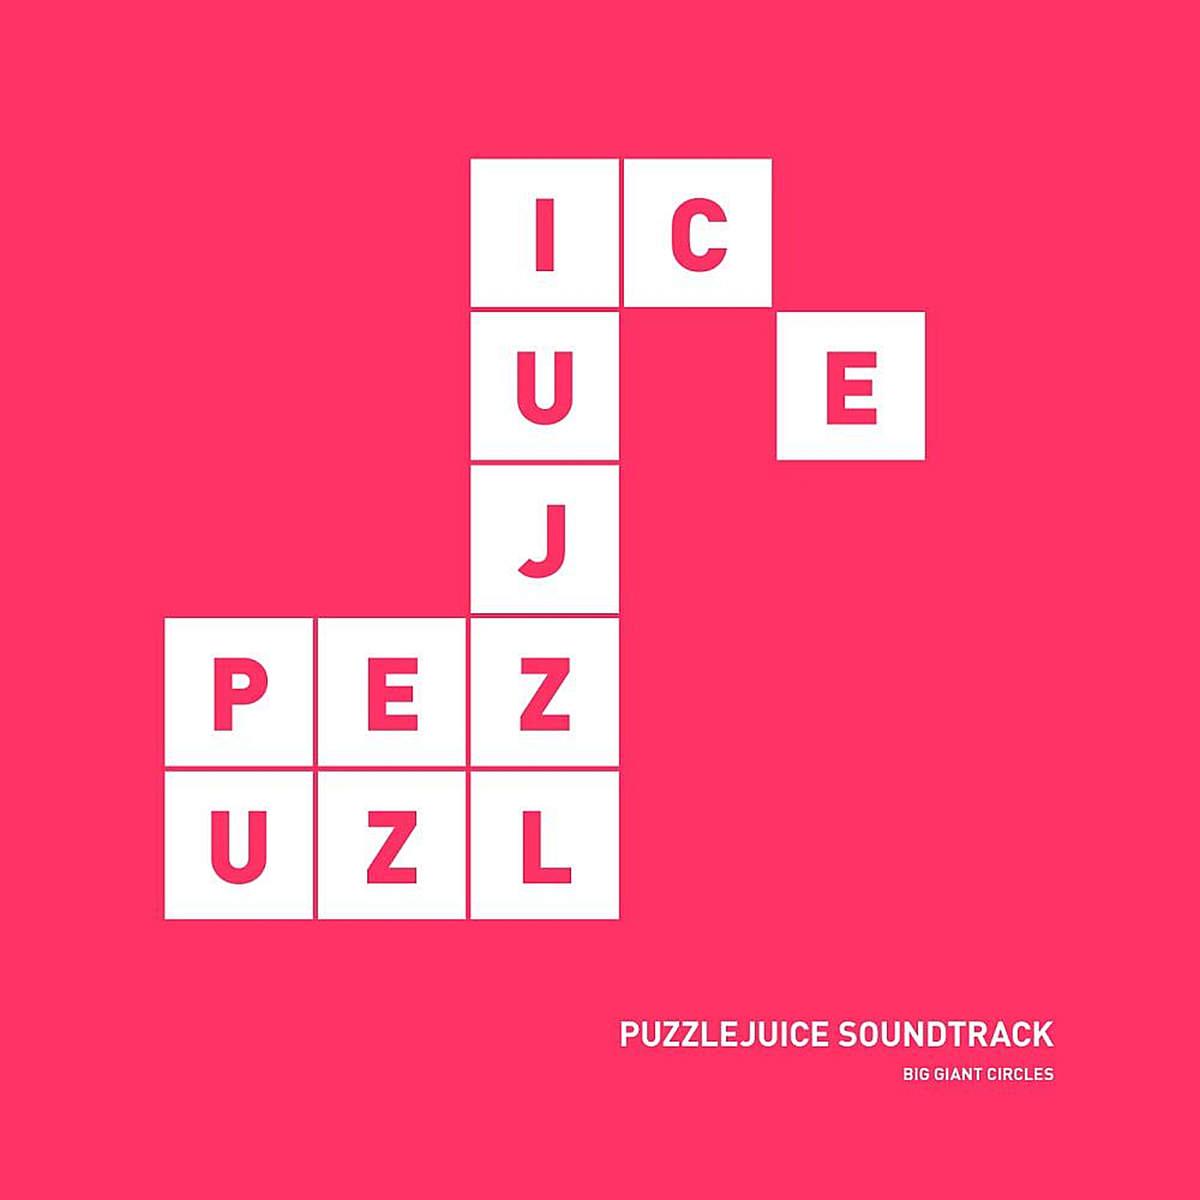 Puzzlejuice_Soundtrack__cover1200x1200.jpg